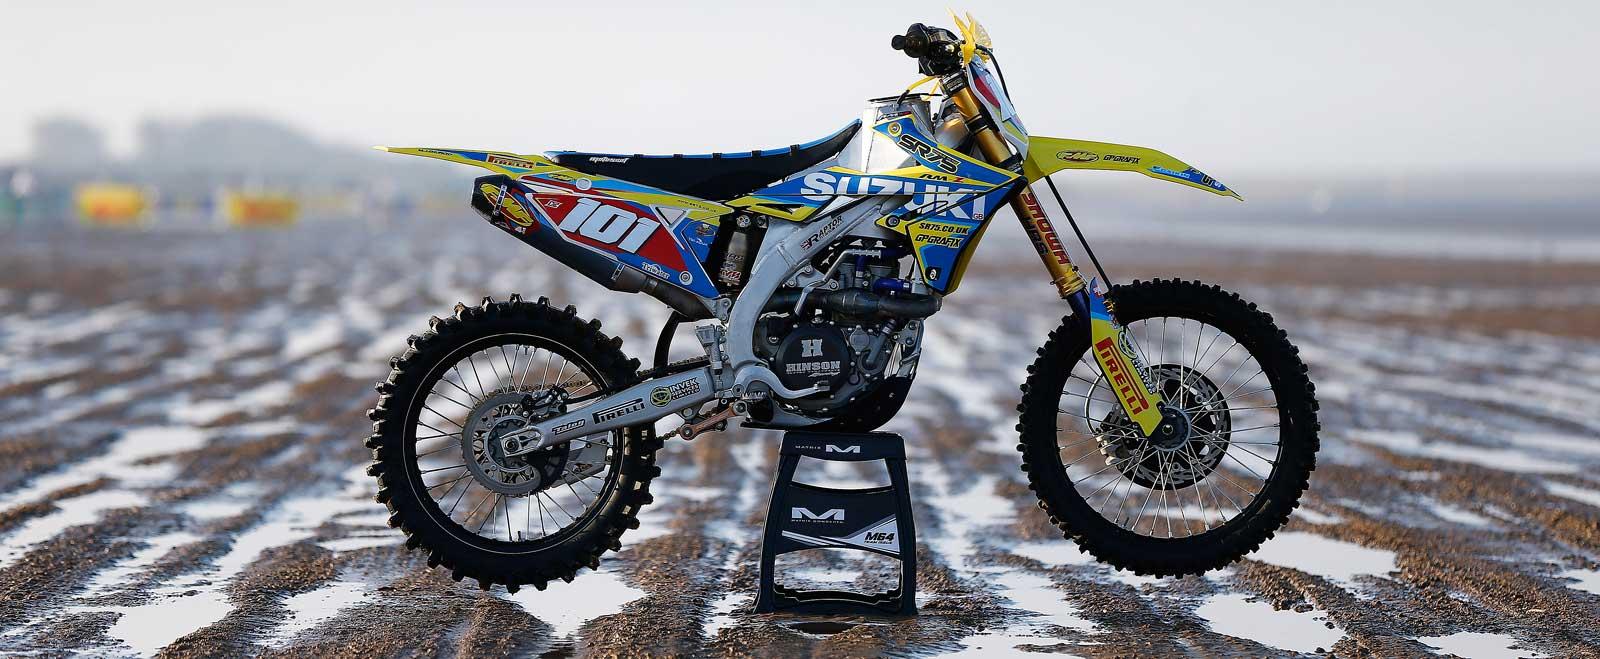 sr75 bike